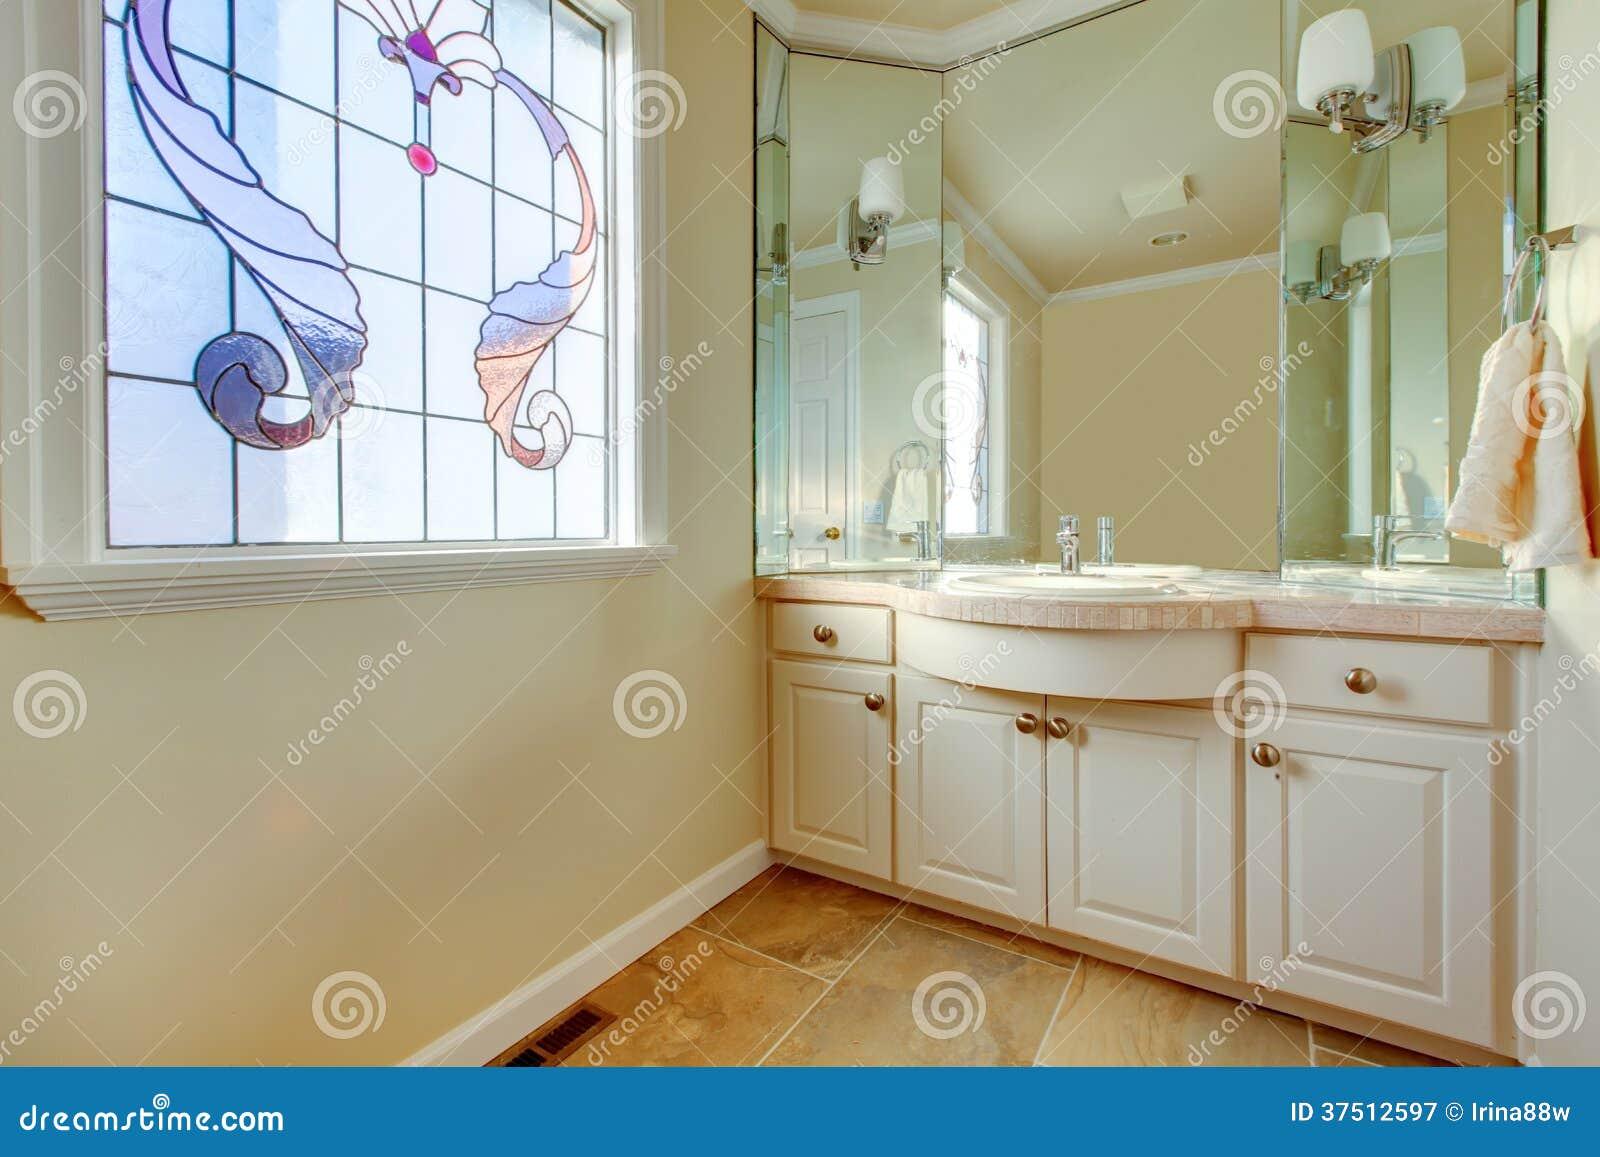 pvblik badkamer idee plattegrond